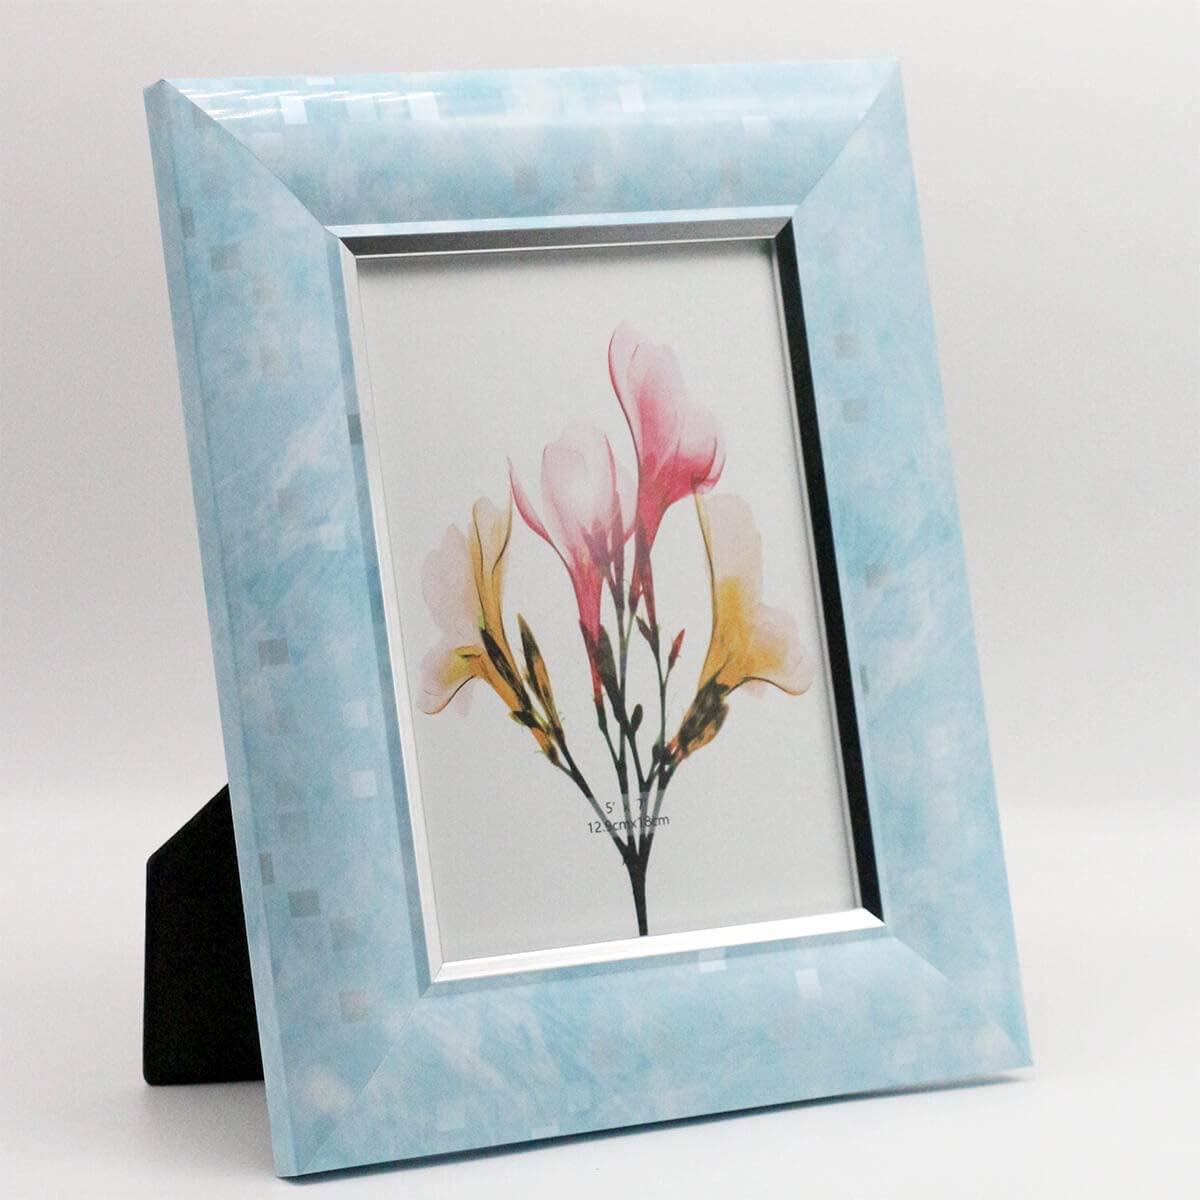 YUNDINGJI Sky Blue & Silver Edge Photo Frames, 5x7, 2-Pack